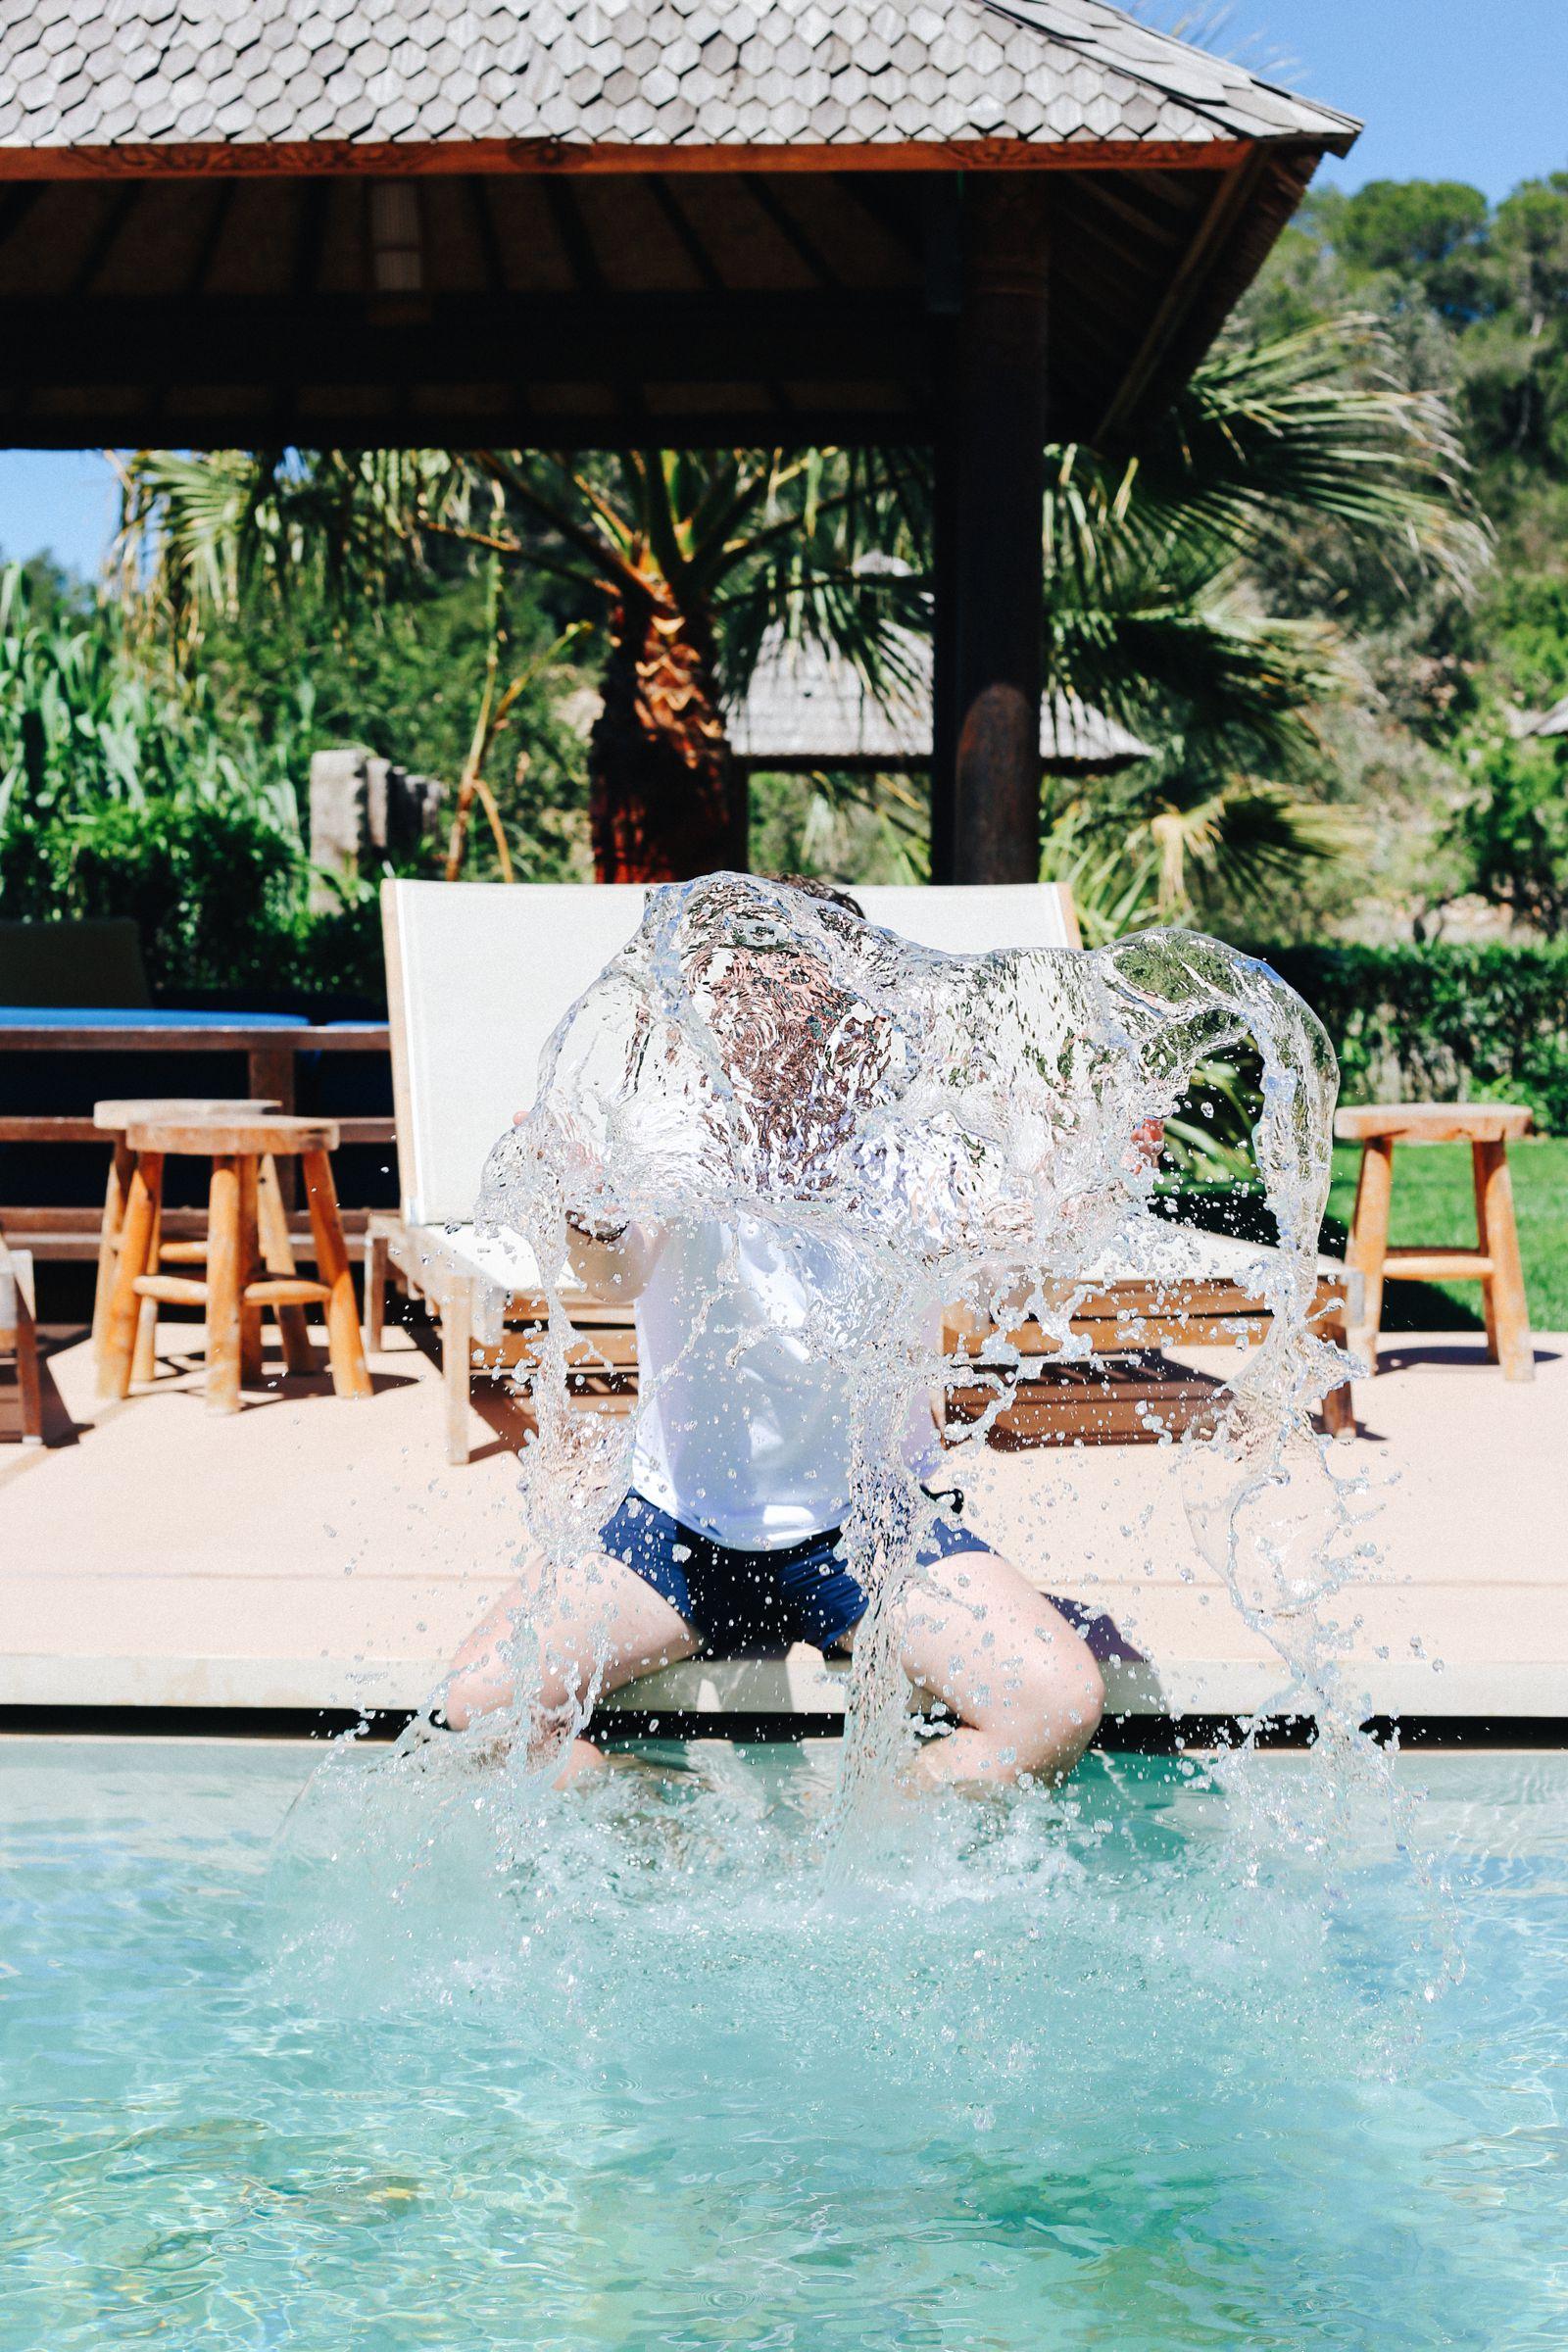 Ibiza Summer Fun In The Sun with Kapten & Sons (11)